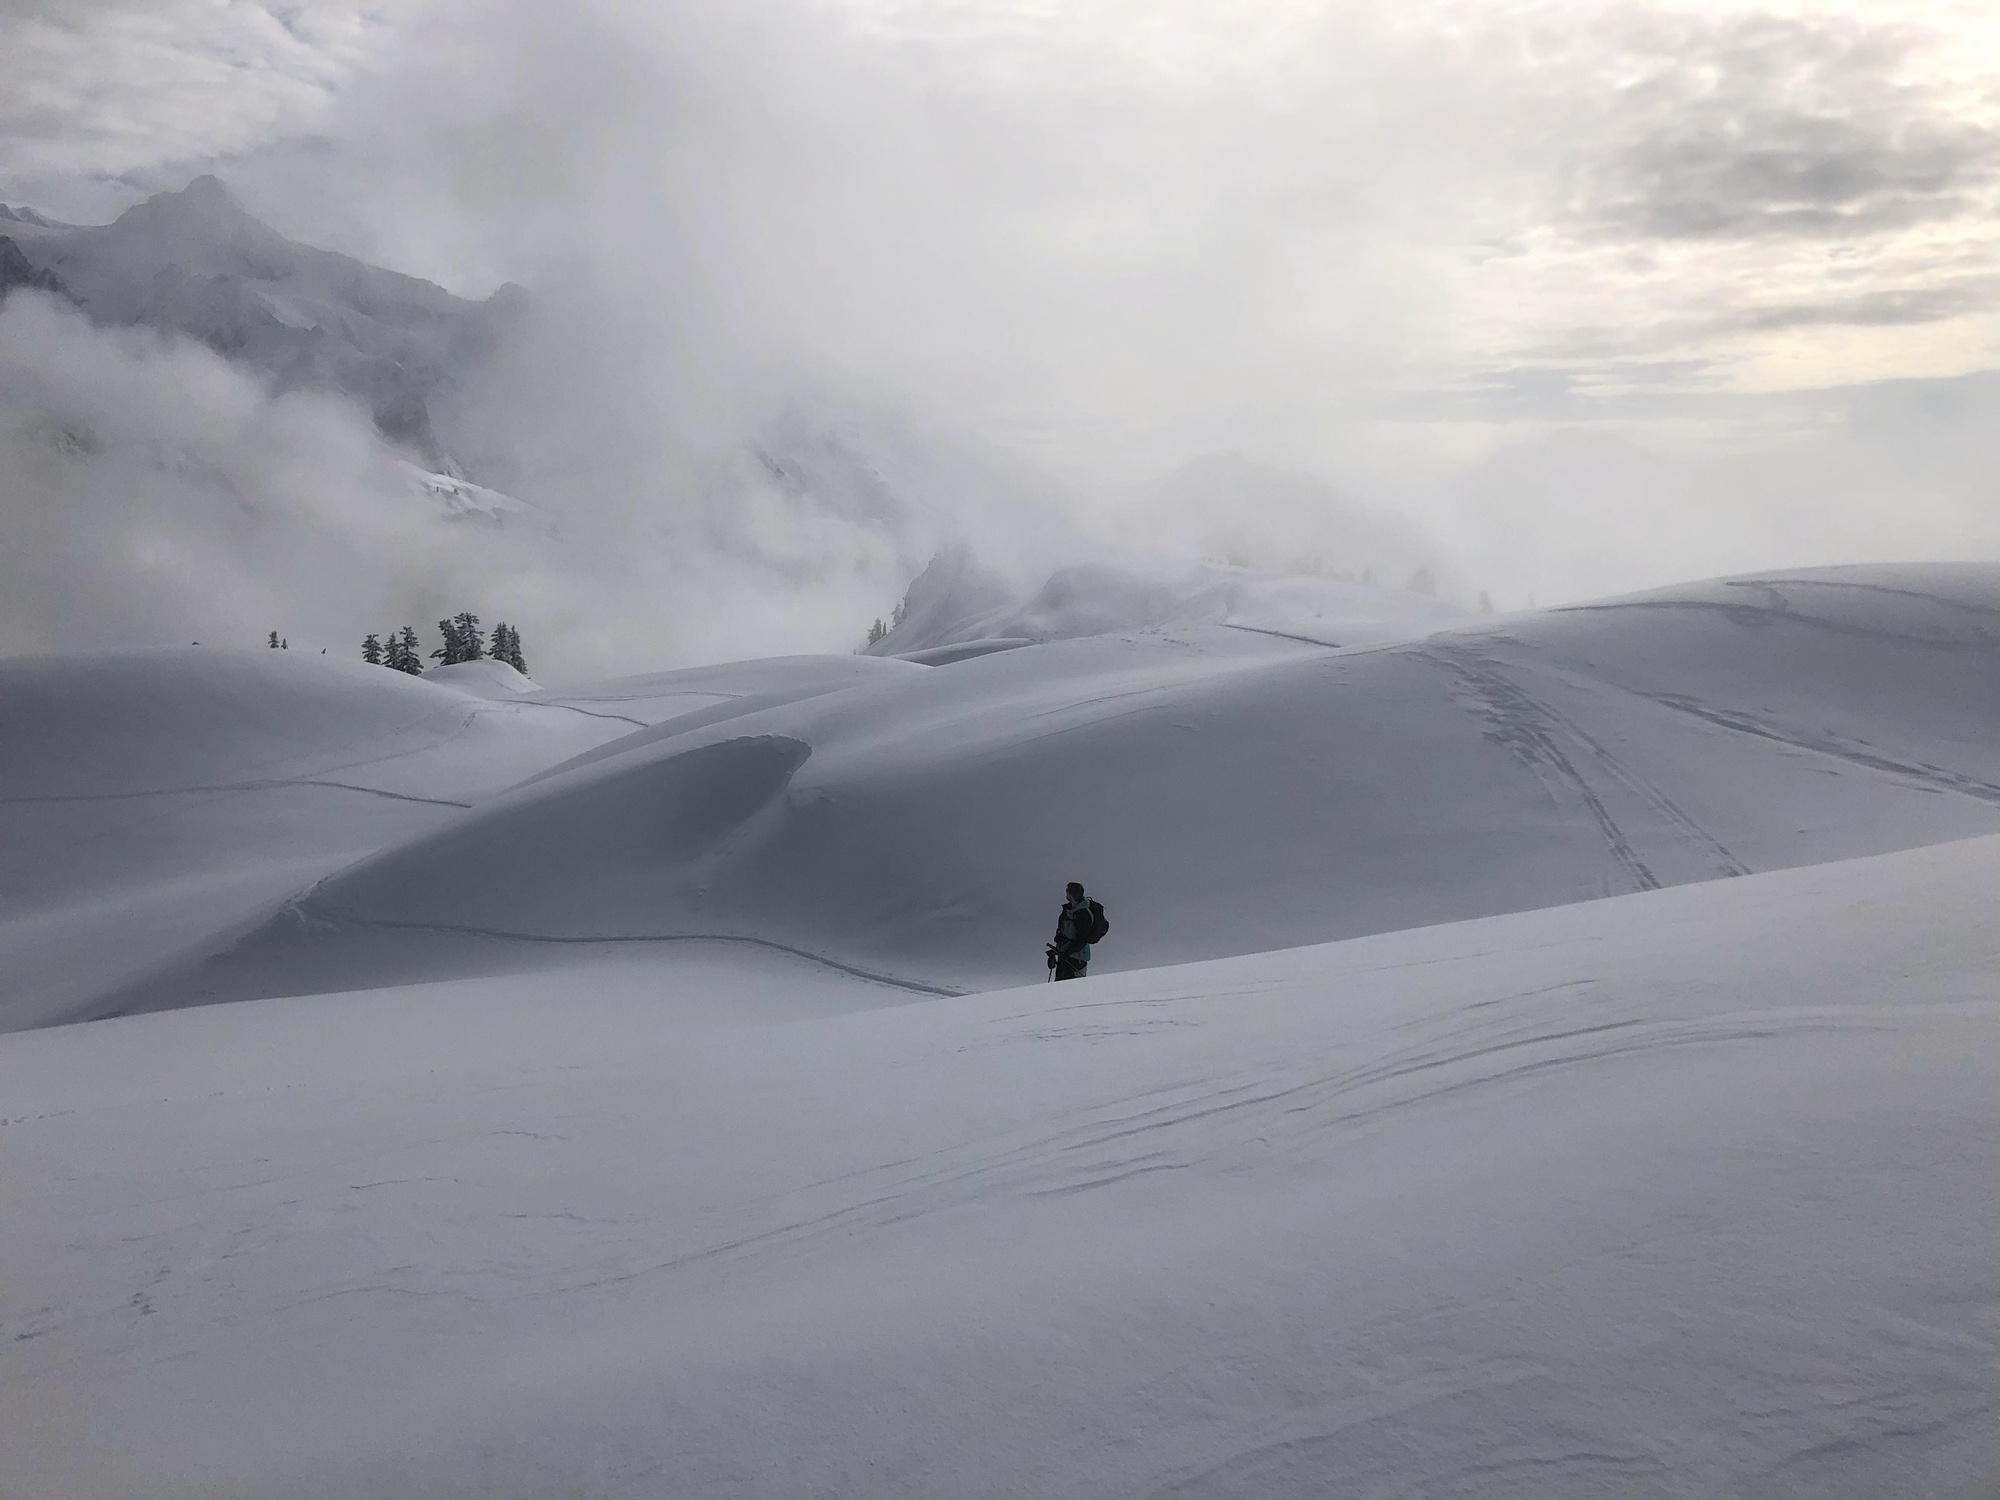 Mt. Baker, WA, Kyl, snowboarding